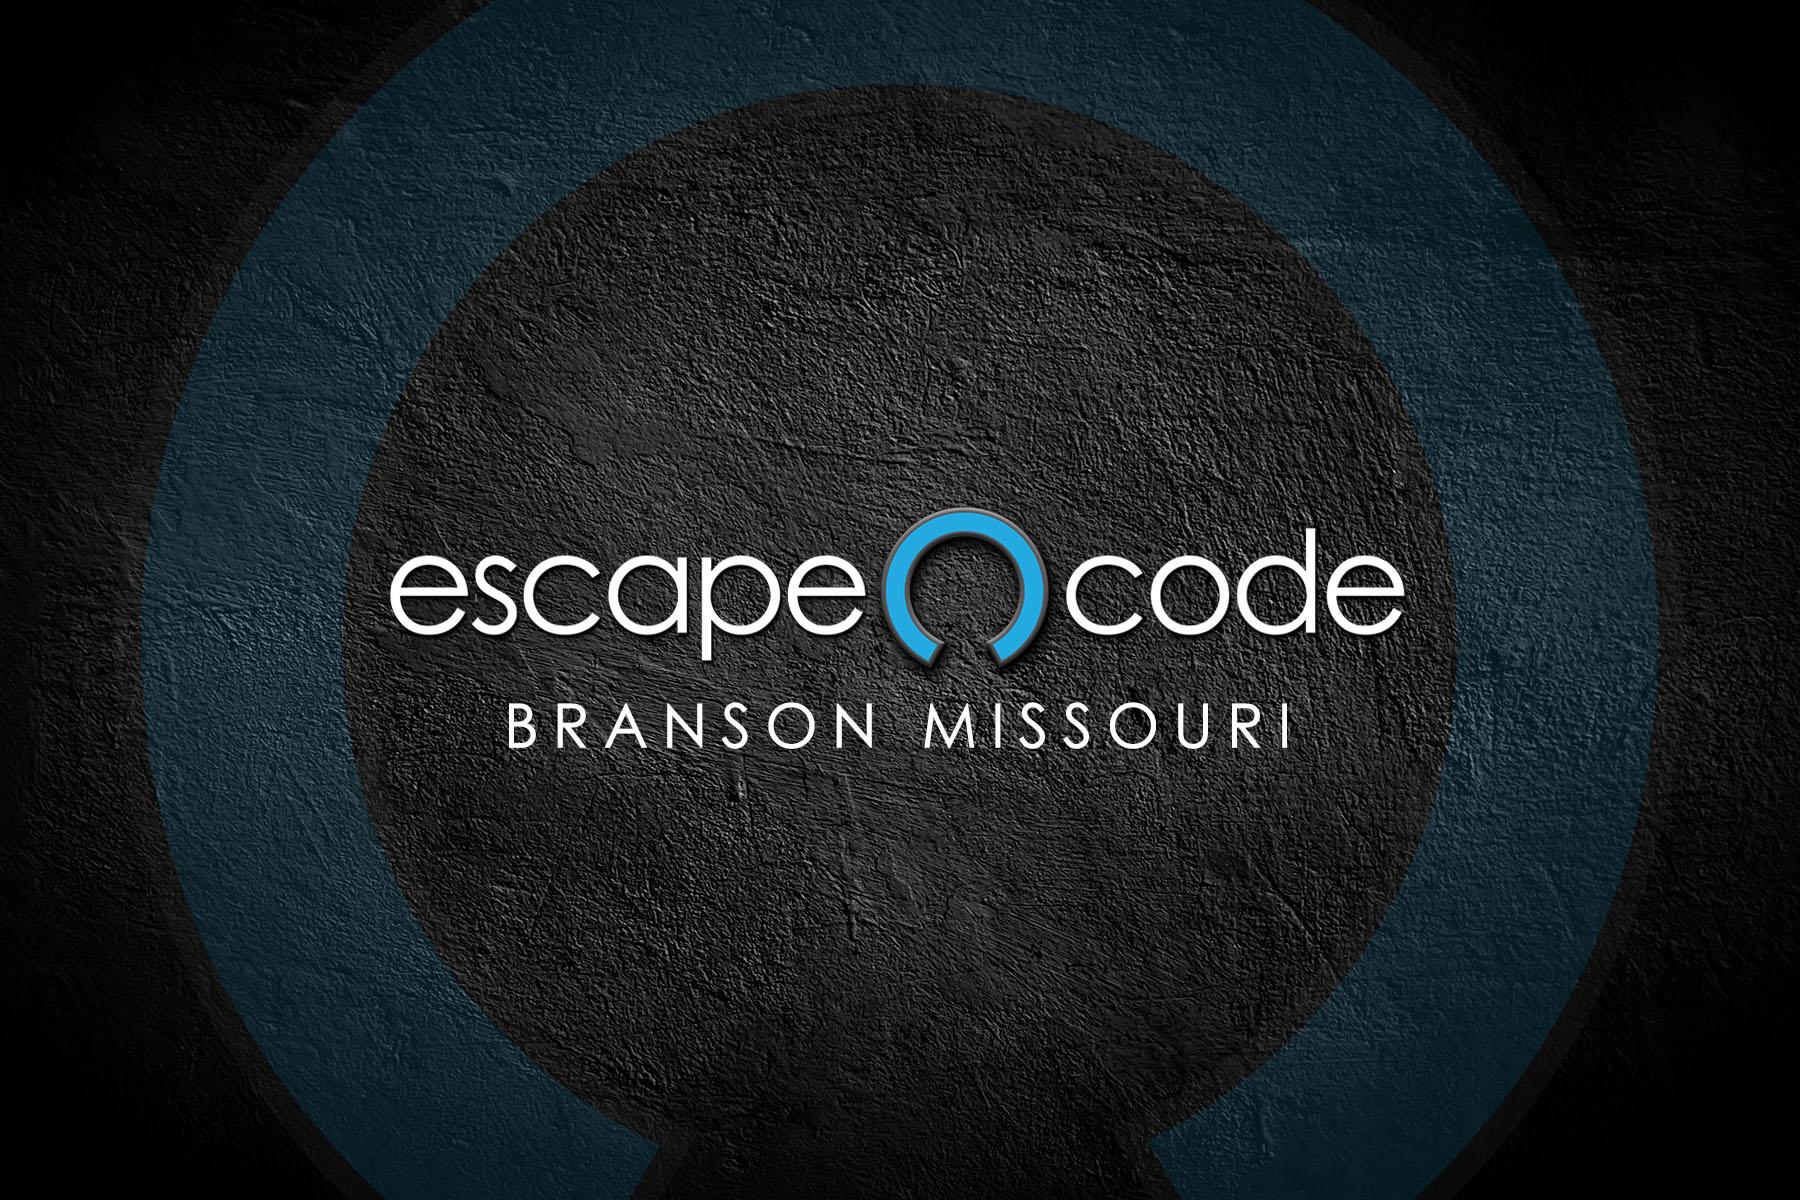 Escape Code Images And Wallpaper 183 Escape Code Branson